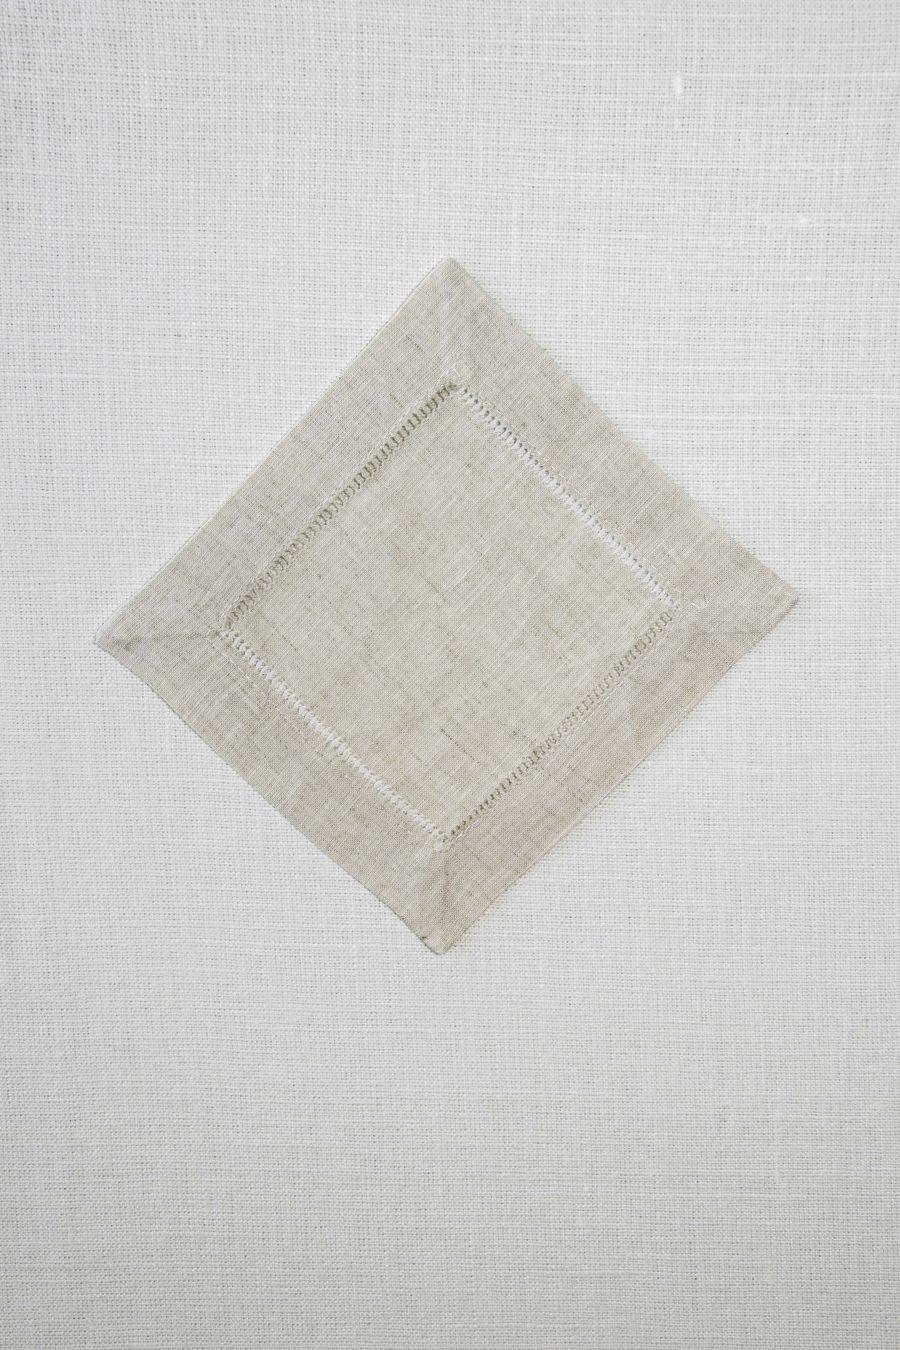 cocktail-napkin-ecru-900x1350.jpg